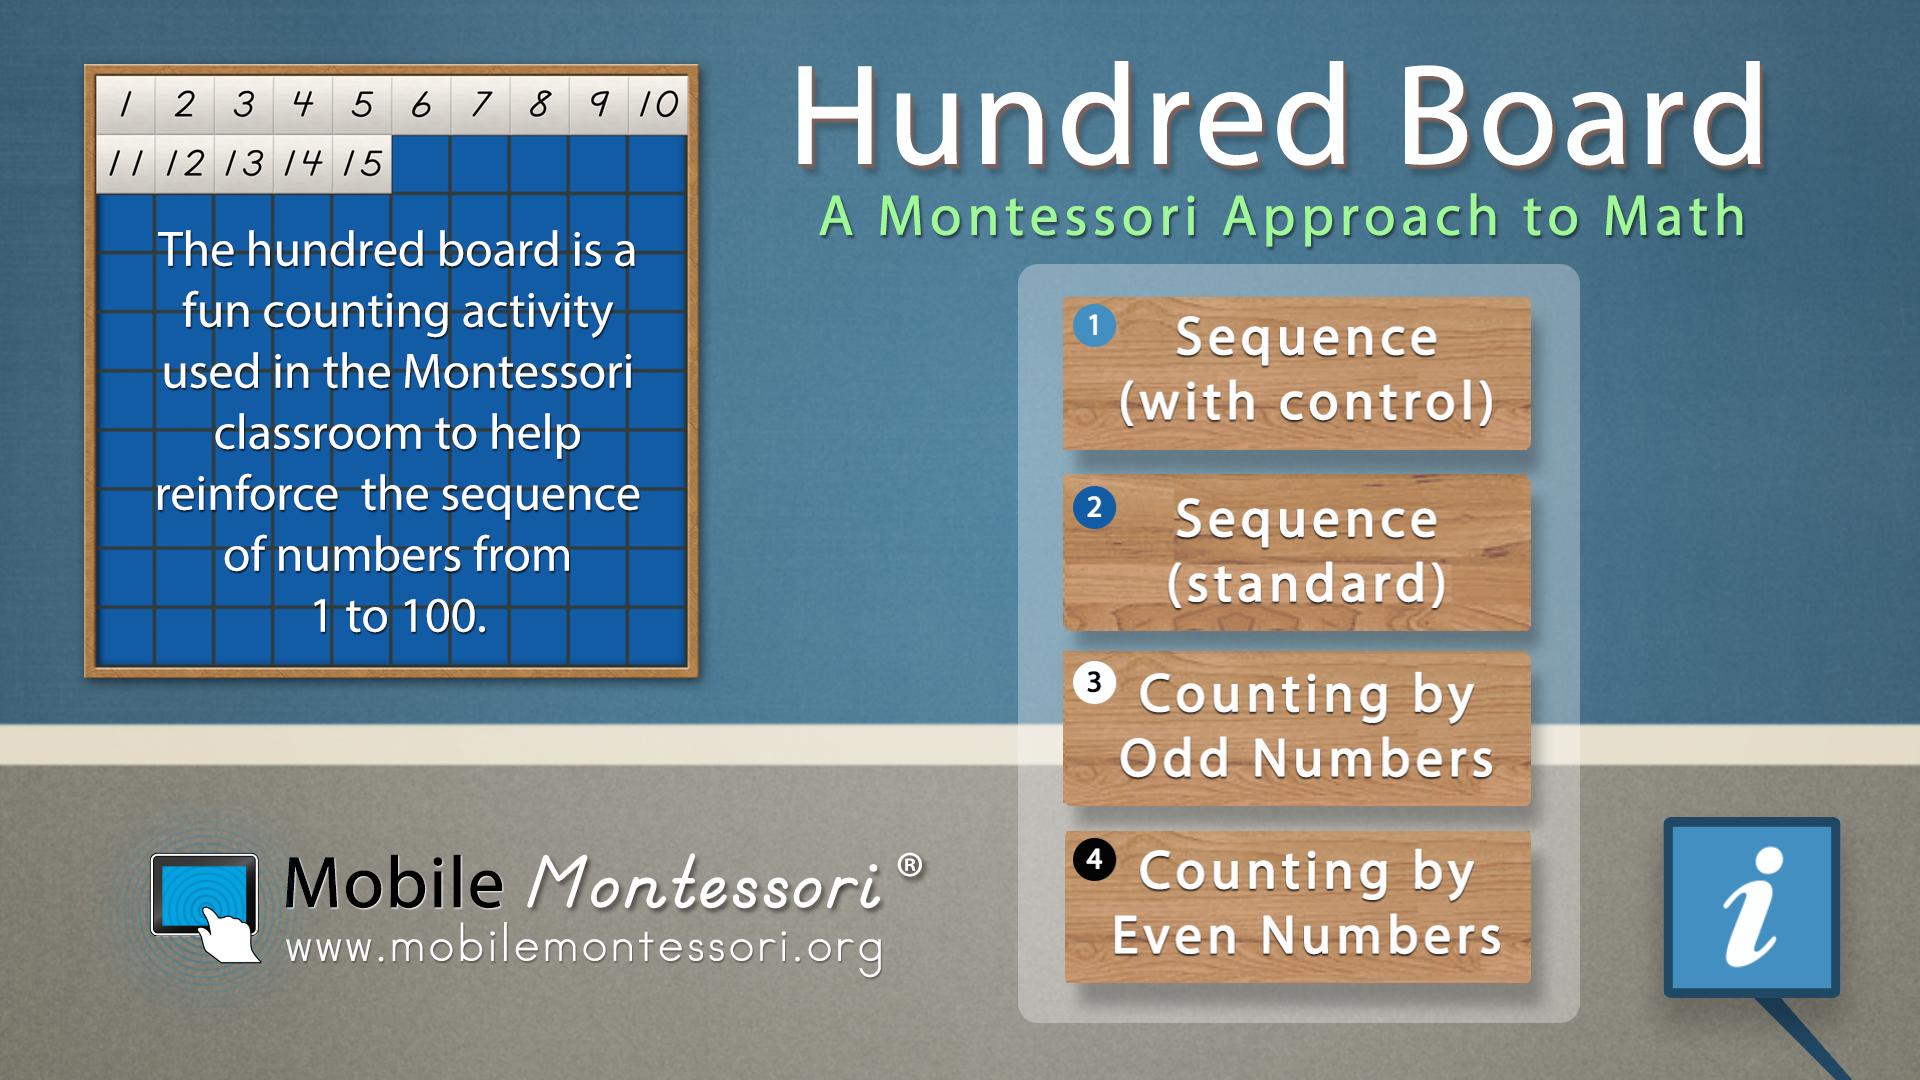 Hundred Board - Math by Mobile Montessori screenshot 1